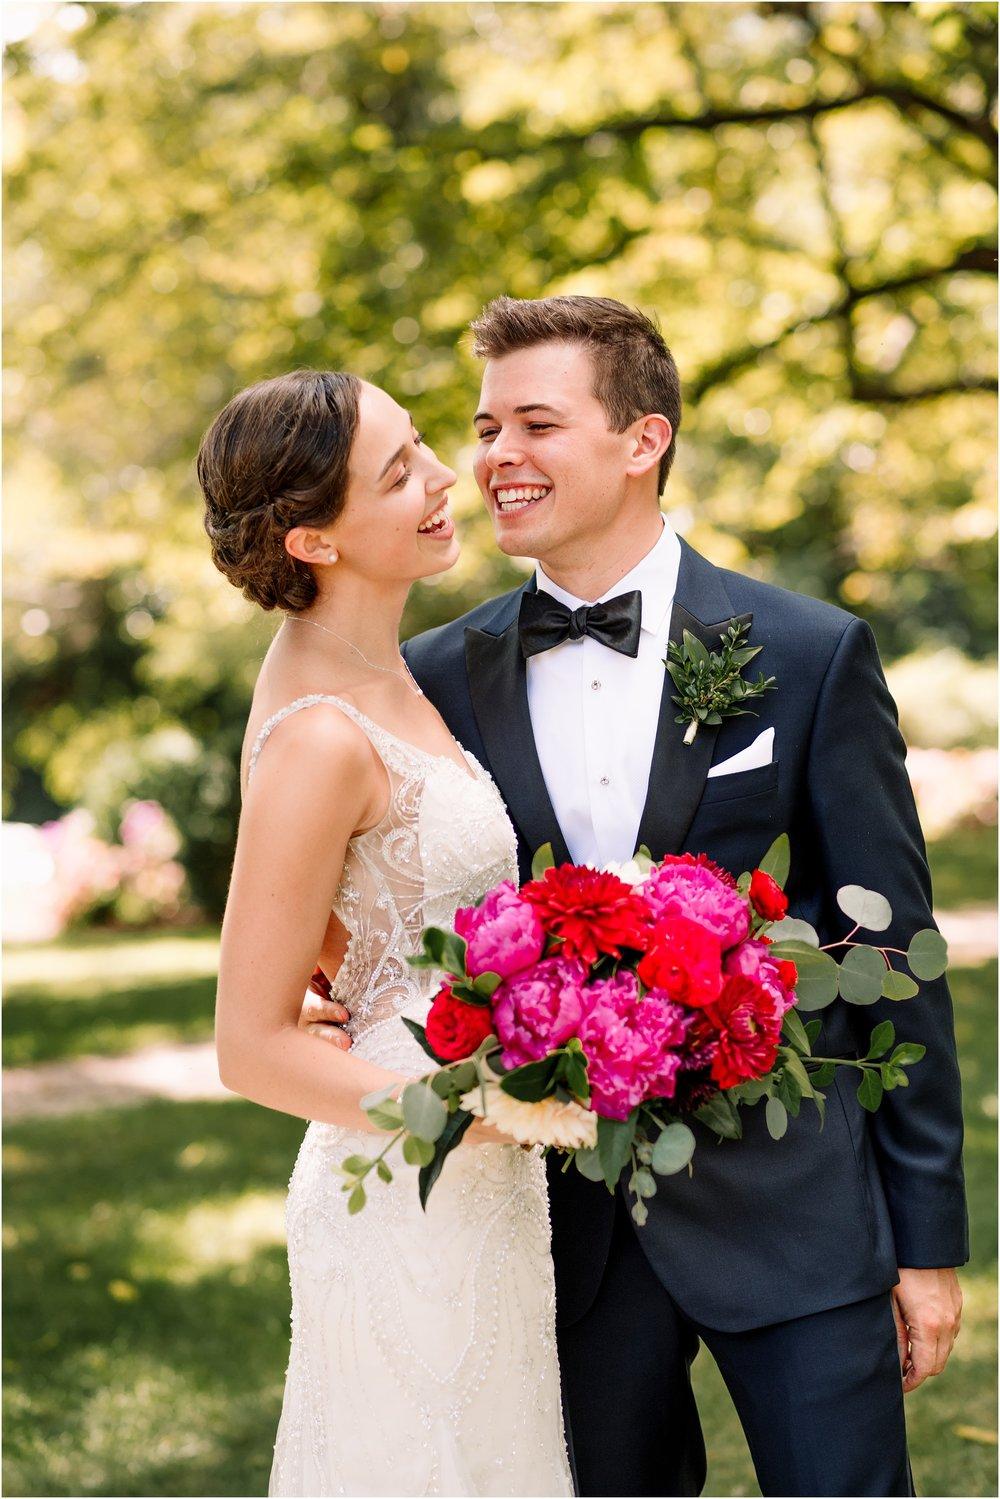 hannah leigh photography Antrim 1844 Wedding_1179.jpg